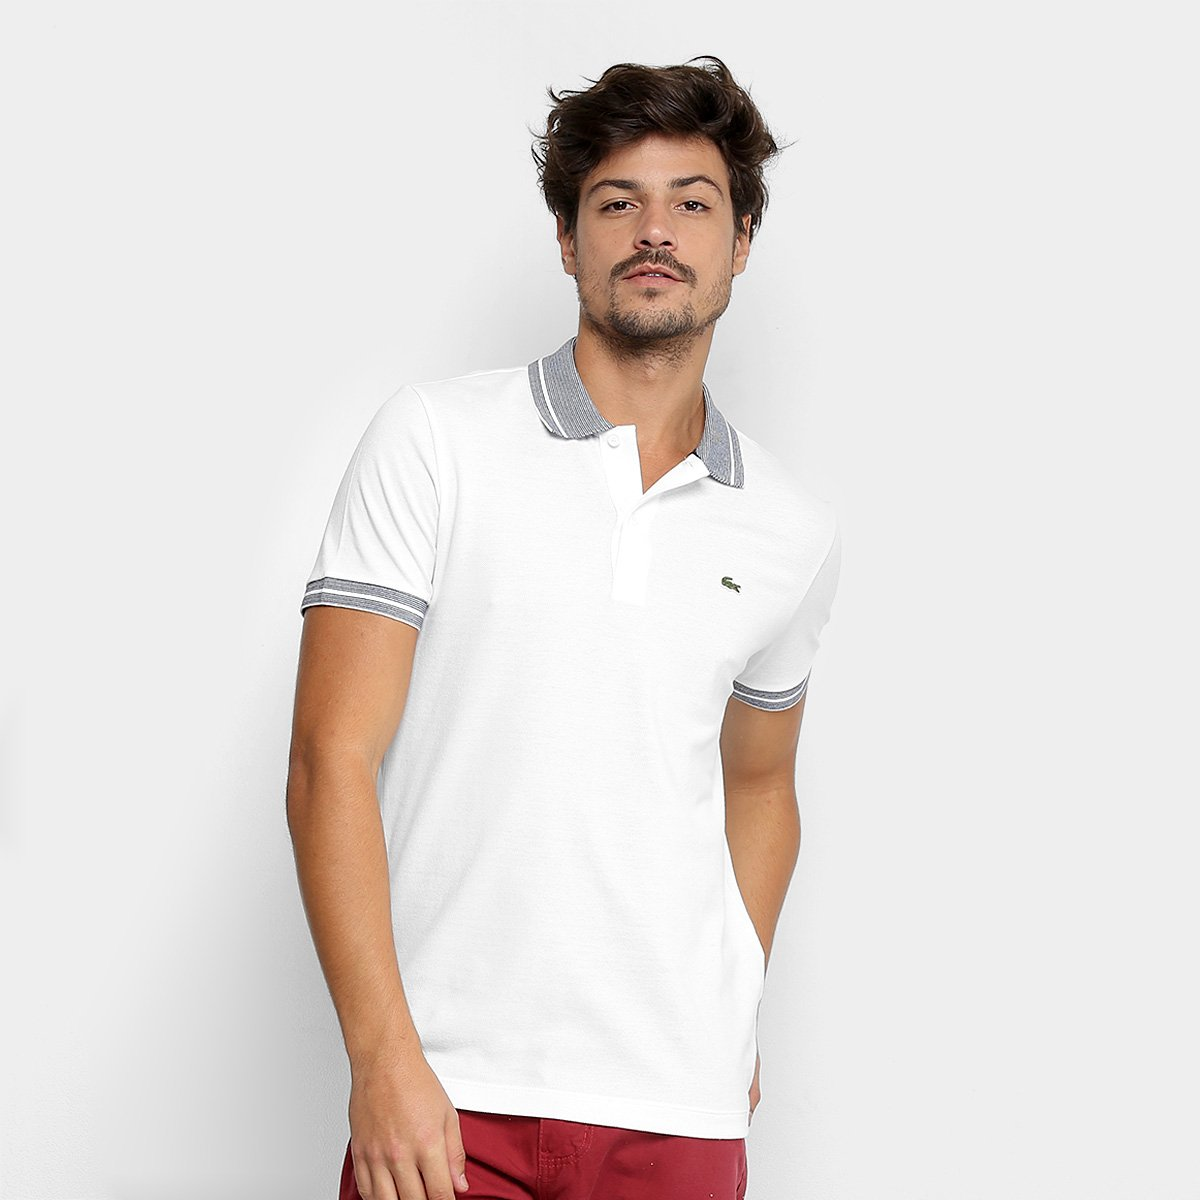 db57c7a31dbe2 Camisa Polo Lacoste Piquet Frisos Masculina - Branco e Marinho - Compre  Agora